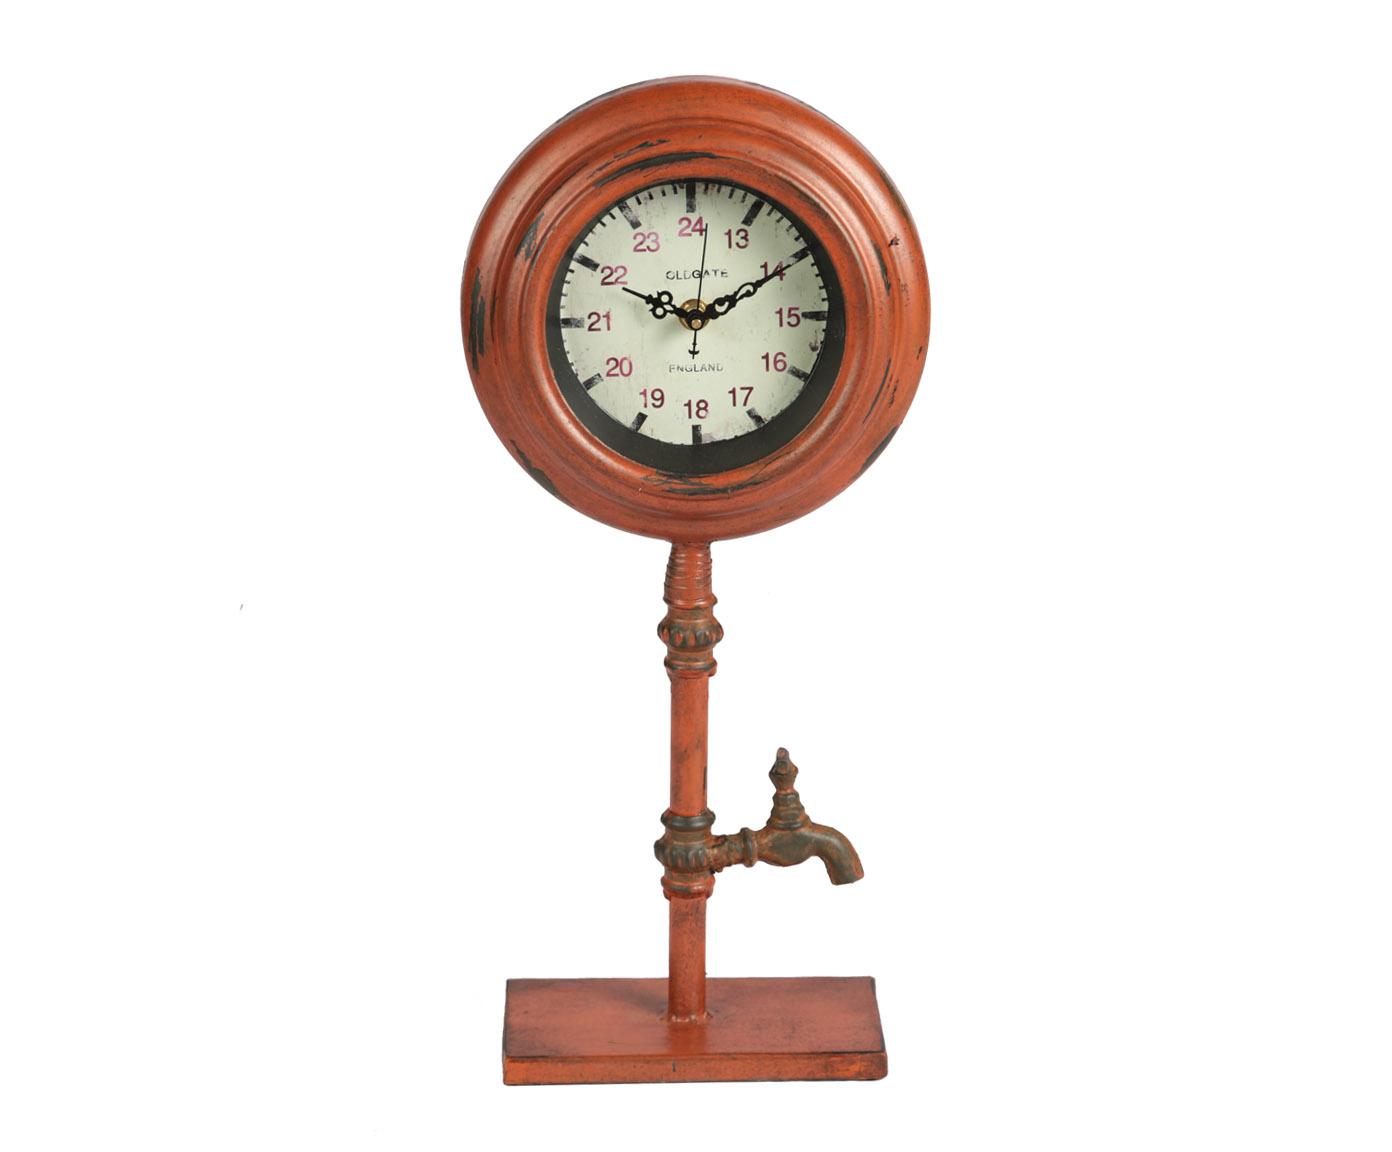 Часы настольныеНастольные часы<br>Кварцевый механизм, работают от батарейки типа АА.<br><br>Material: Металл<br>Width см: 20<br>Depth см: 8,5<br>Height см: 42,5